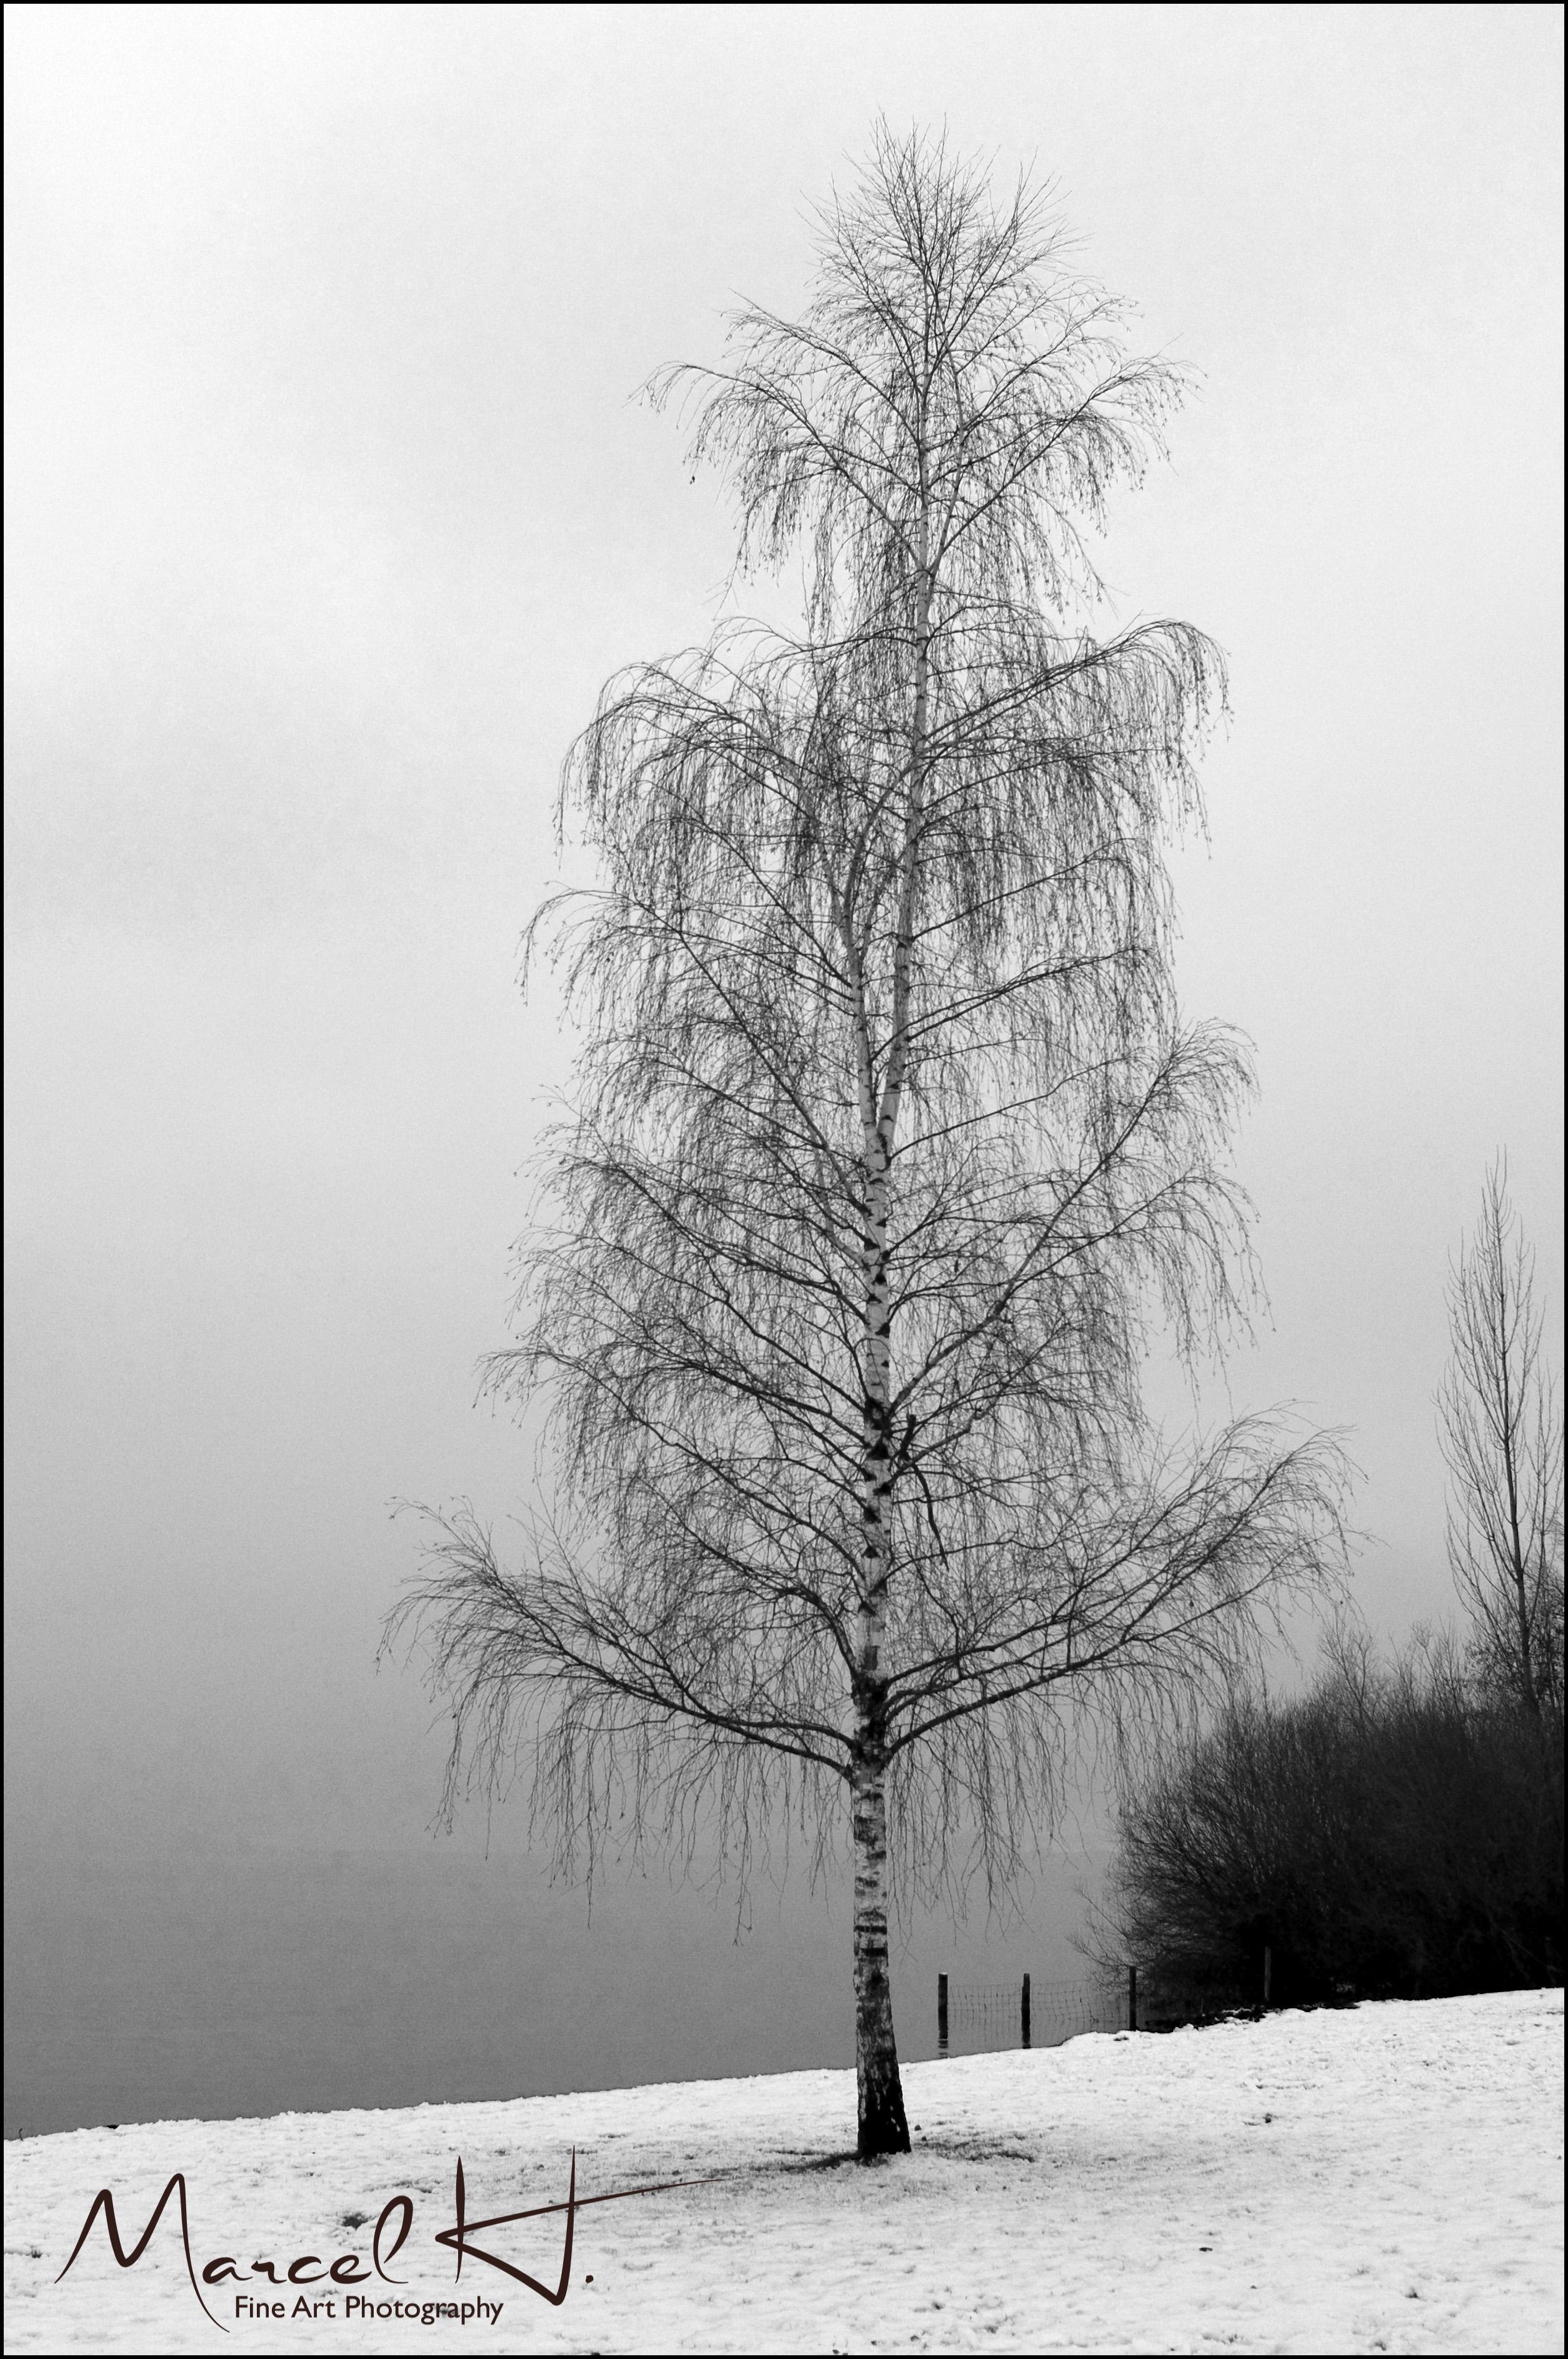 Nebel_Birke